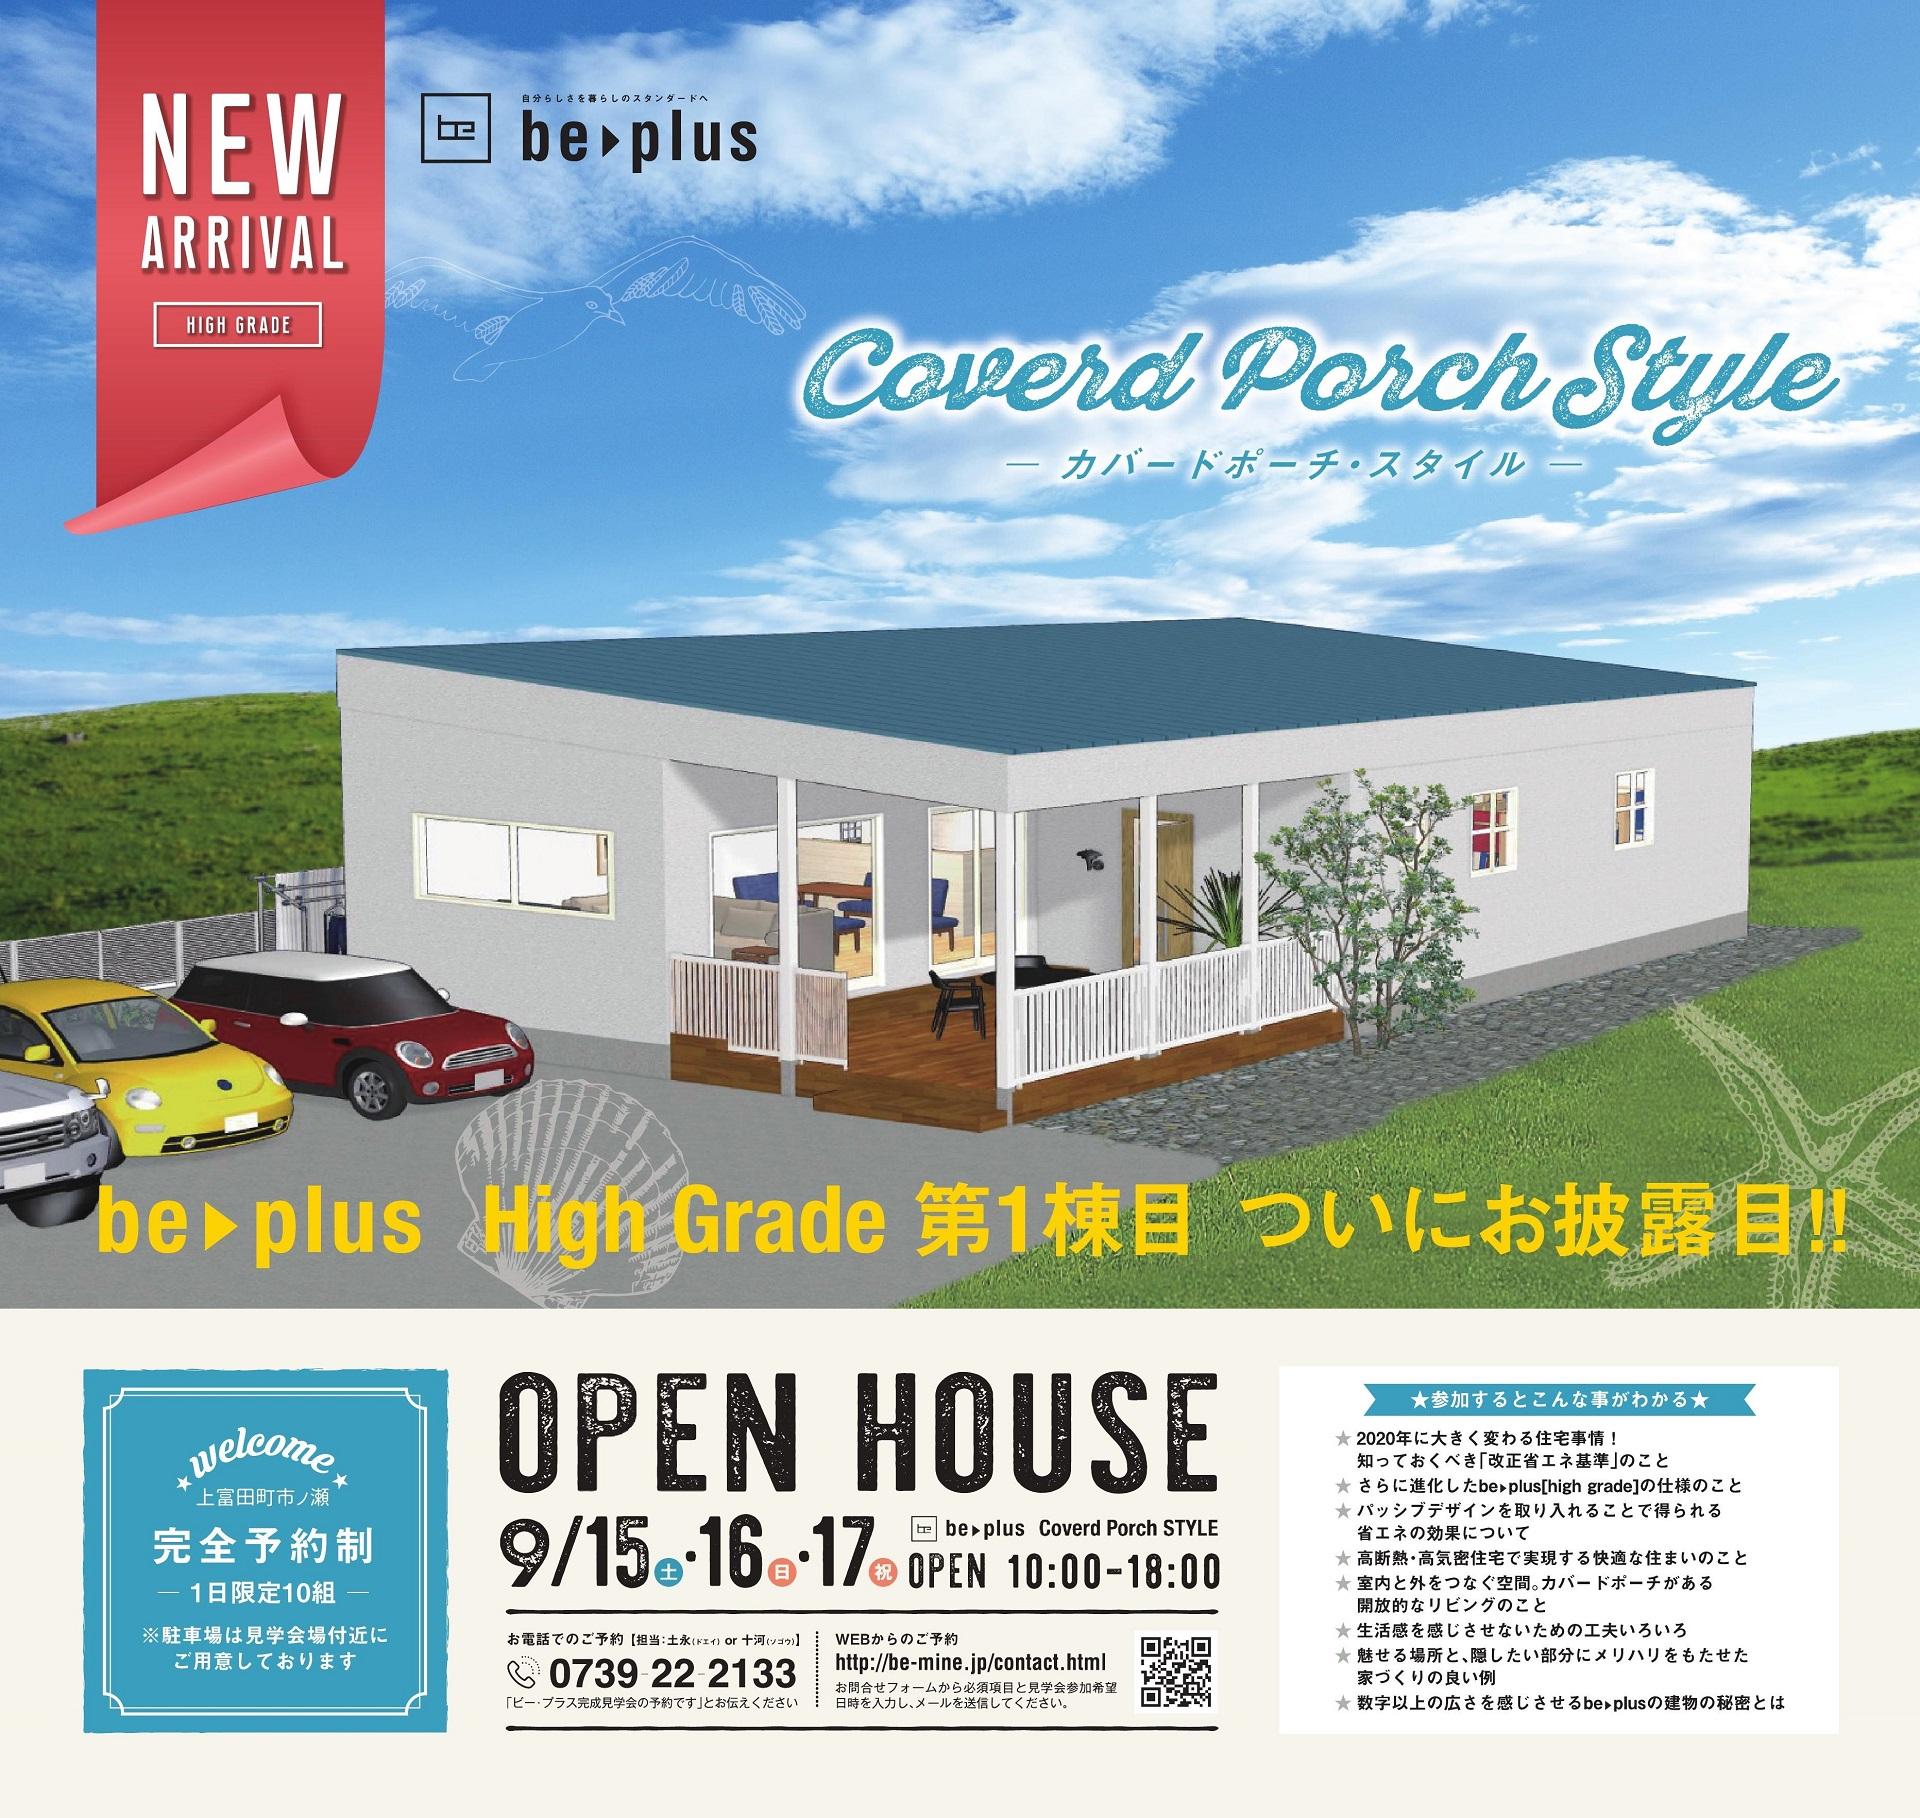 be>plus 第16棟目竣工記念見学会  in 上富田町市ノ瀬